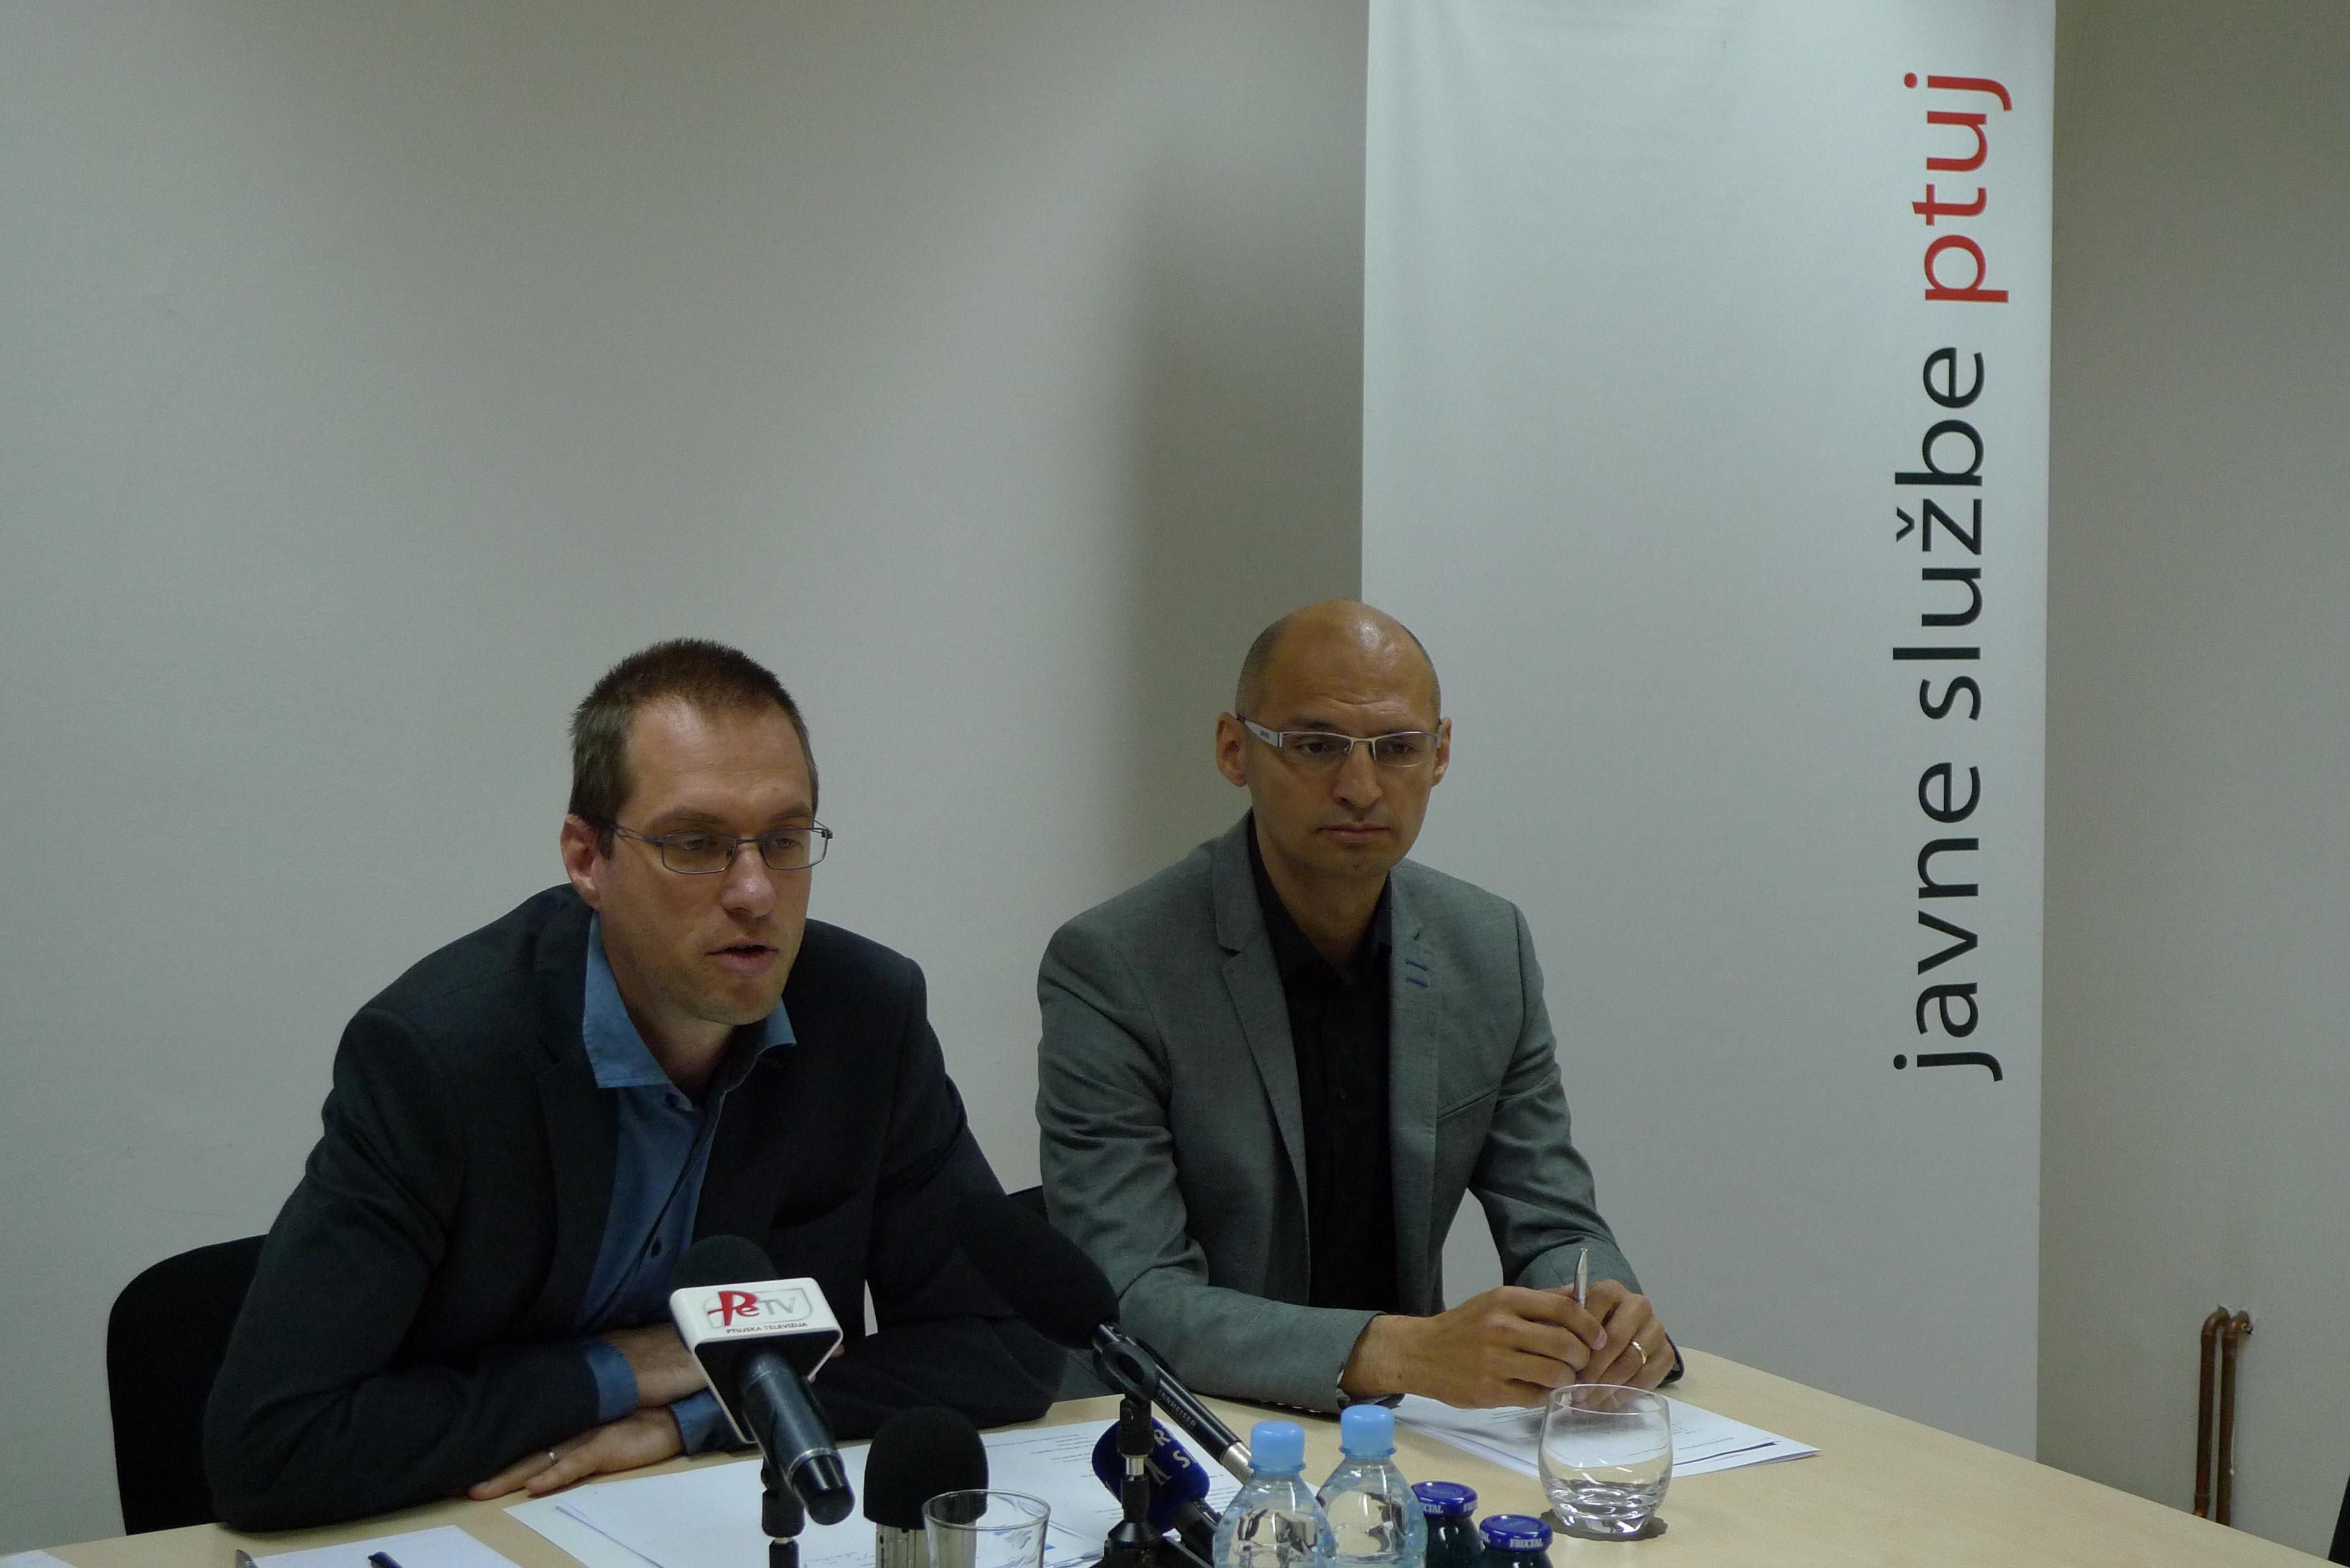 Novinarska konferenca - Javne sluzbe Ptuj